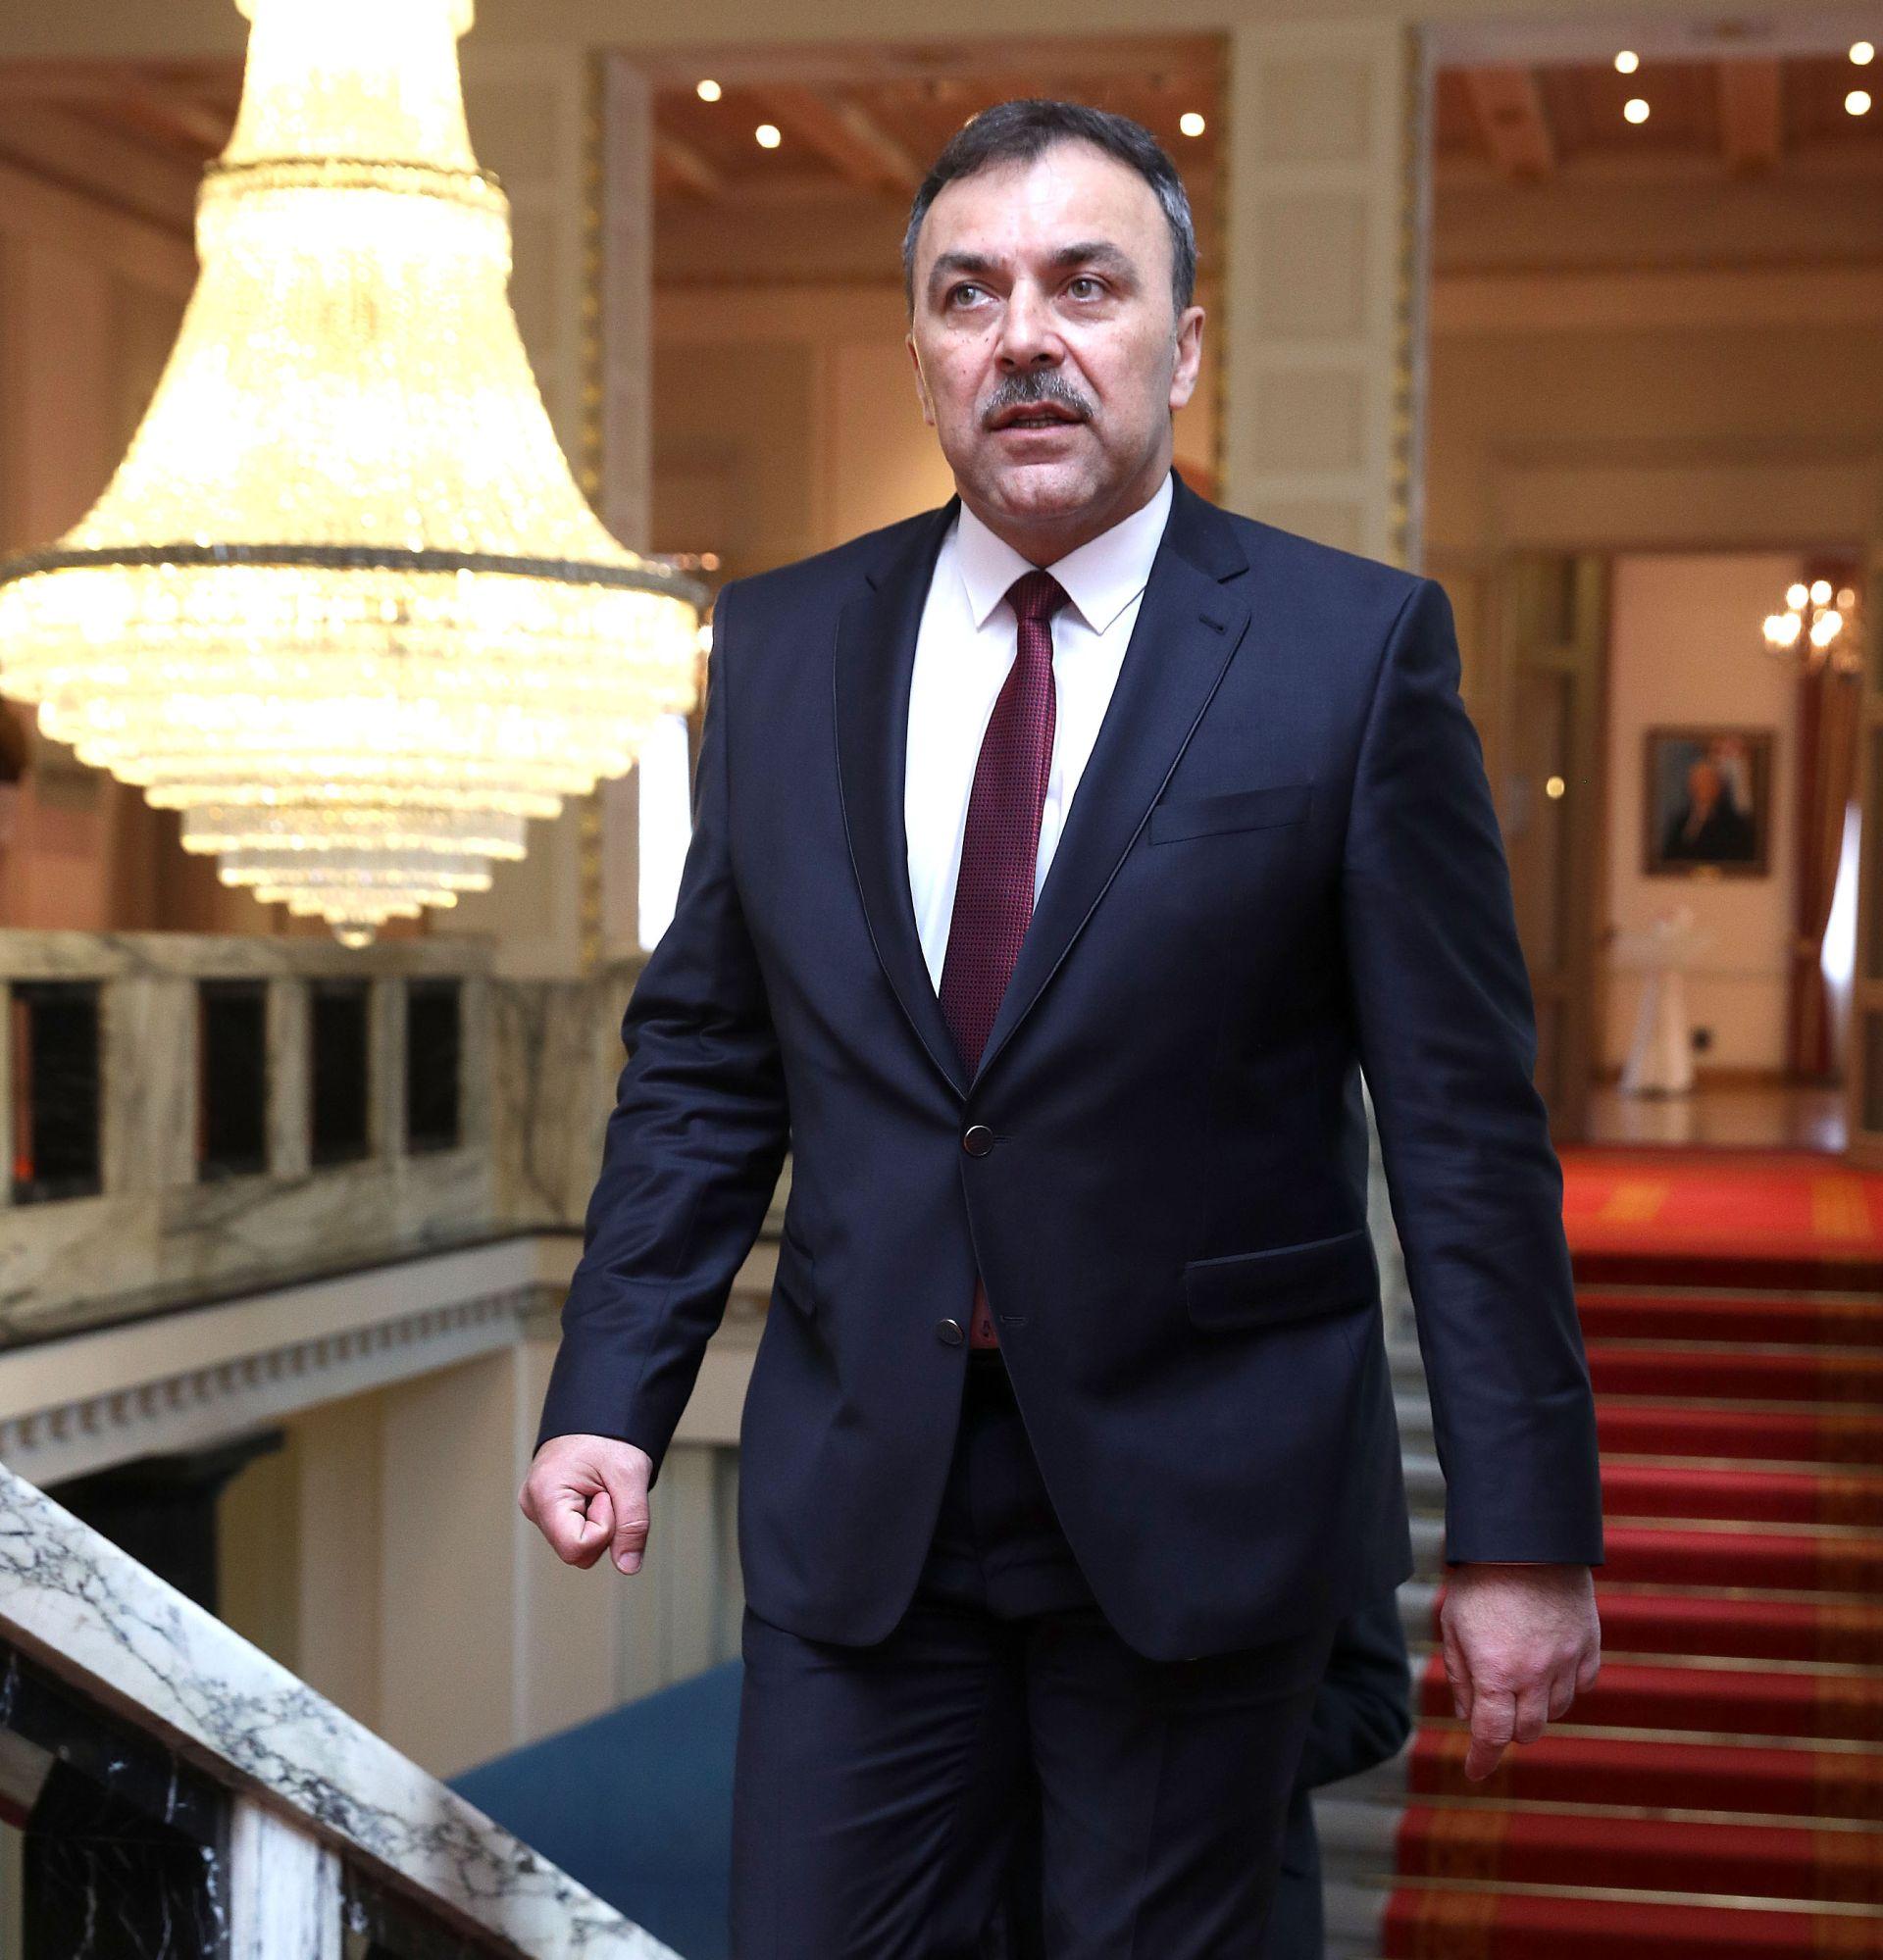 SCHENGEN: Ministar Orepić sa slovenskom kolegicom o suradnji na granici